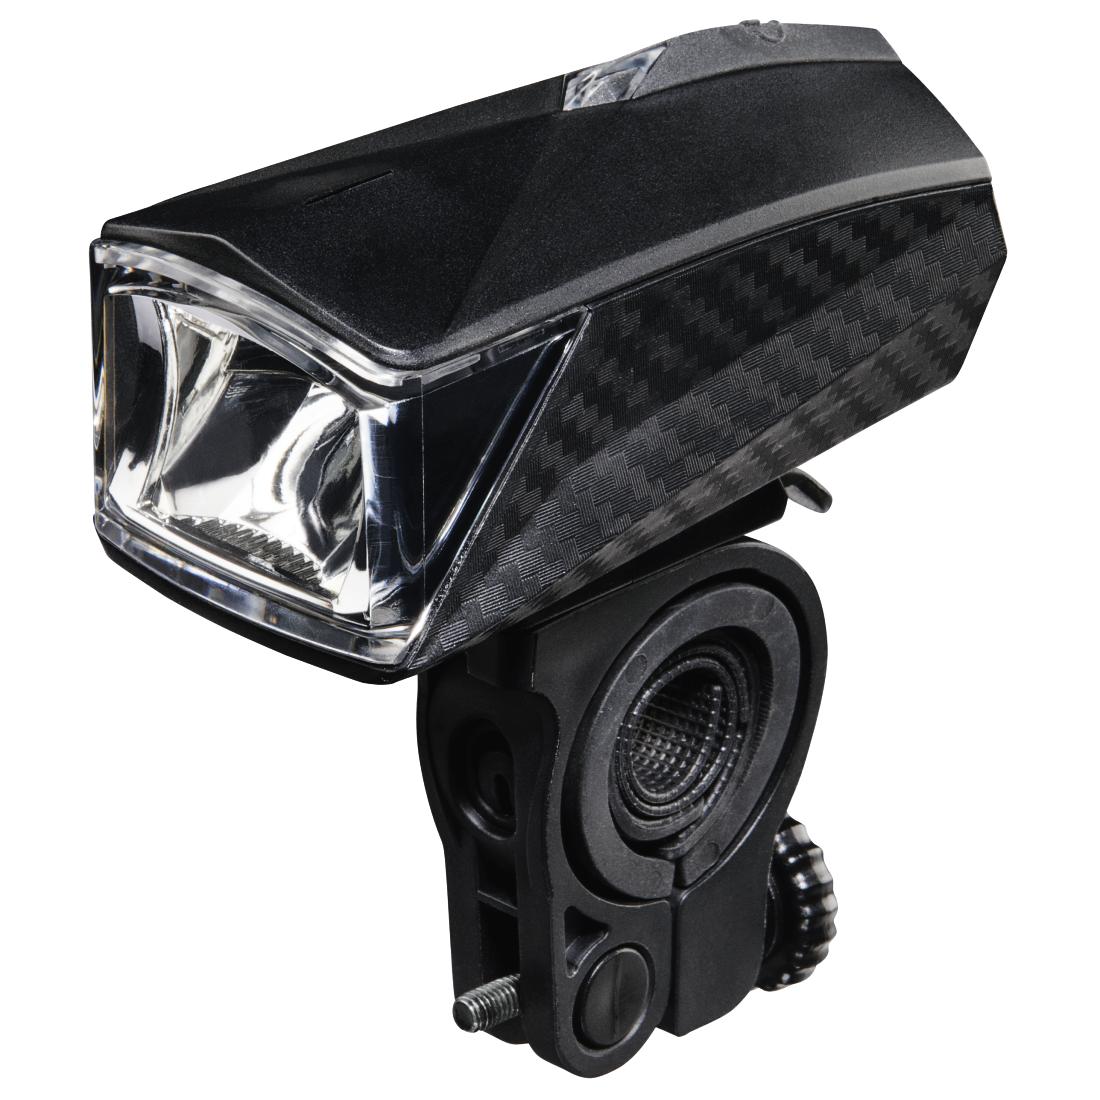 00178106 hama fahrrad frontlicht profi mit 1 led hama de. Black Bedroom Furniture Sets. Home Design Ideas